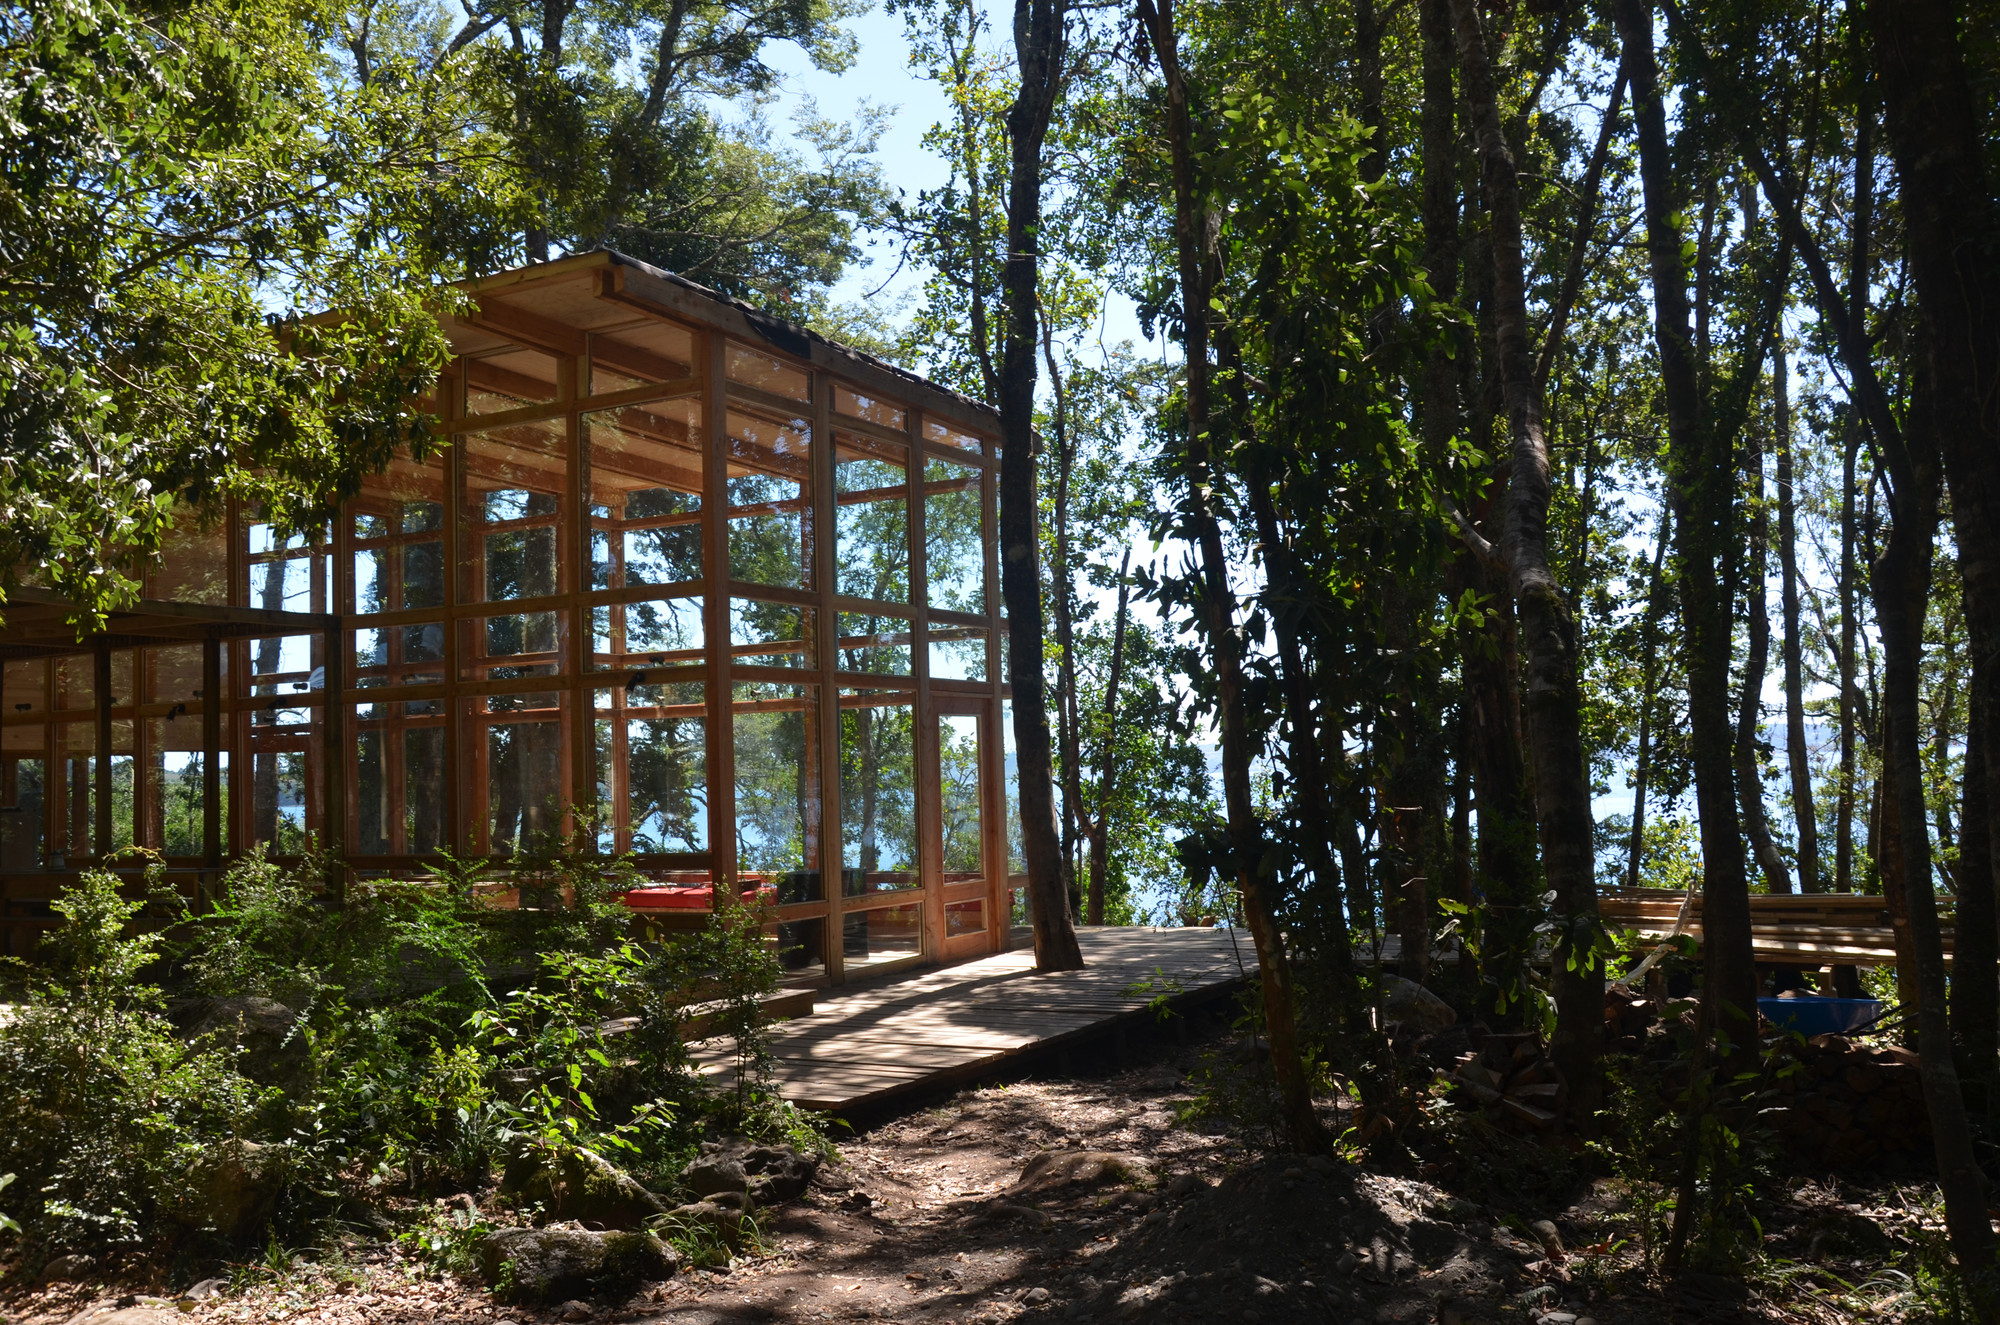 Puyehue Tag Plataforma Arquitectura # Muebles Puyehue